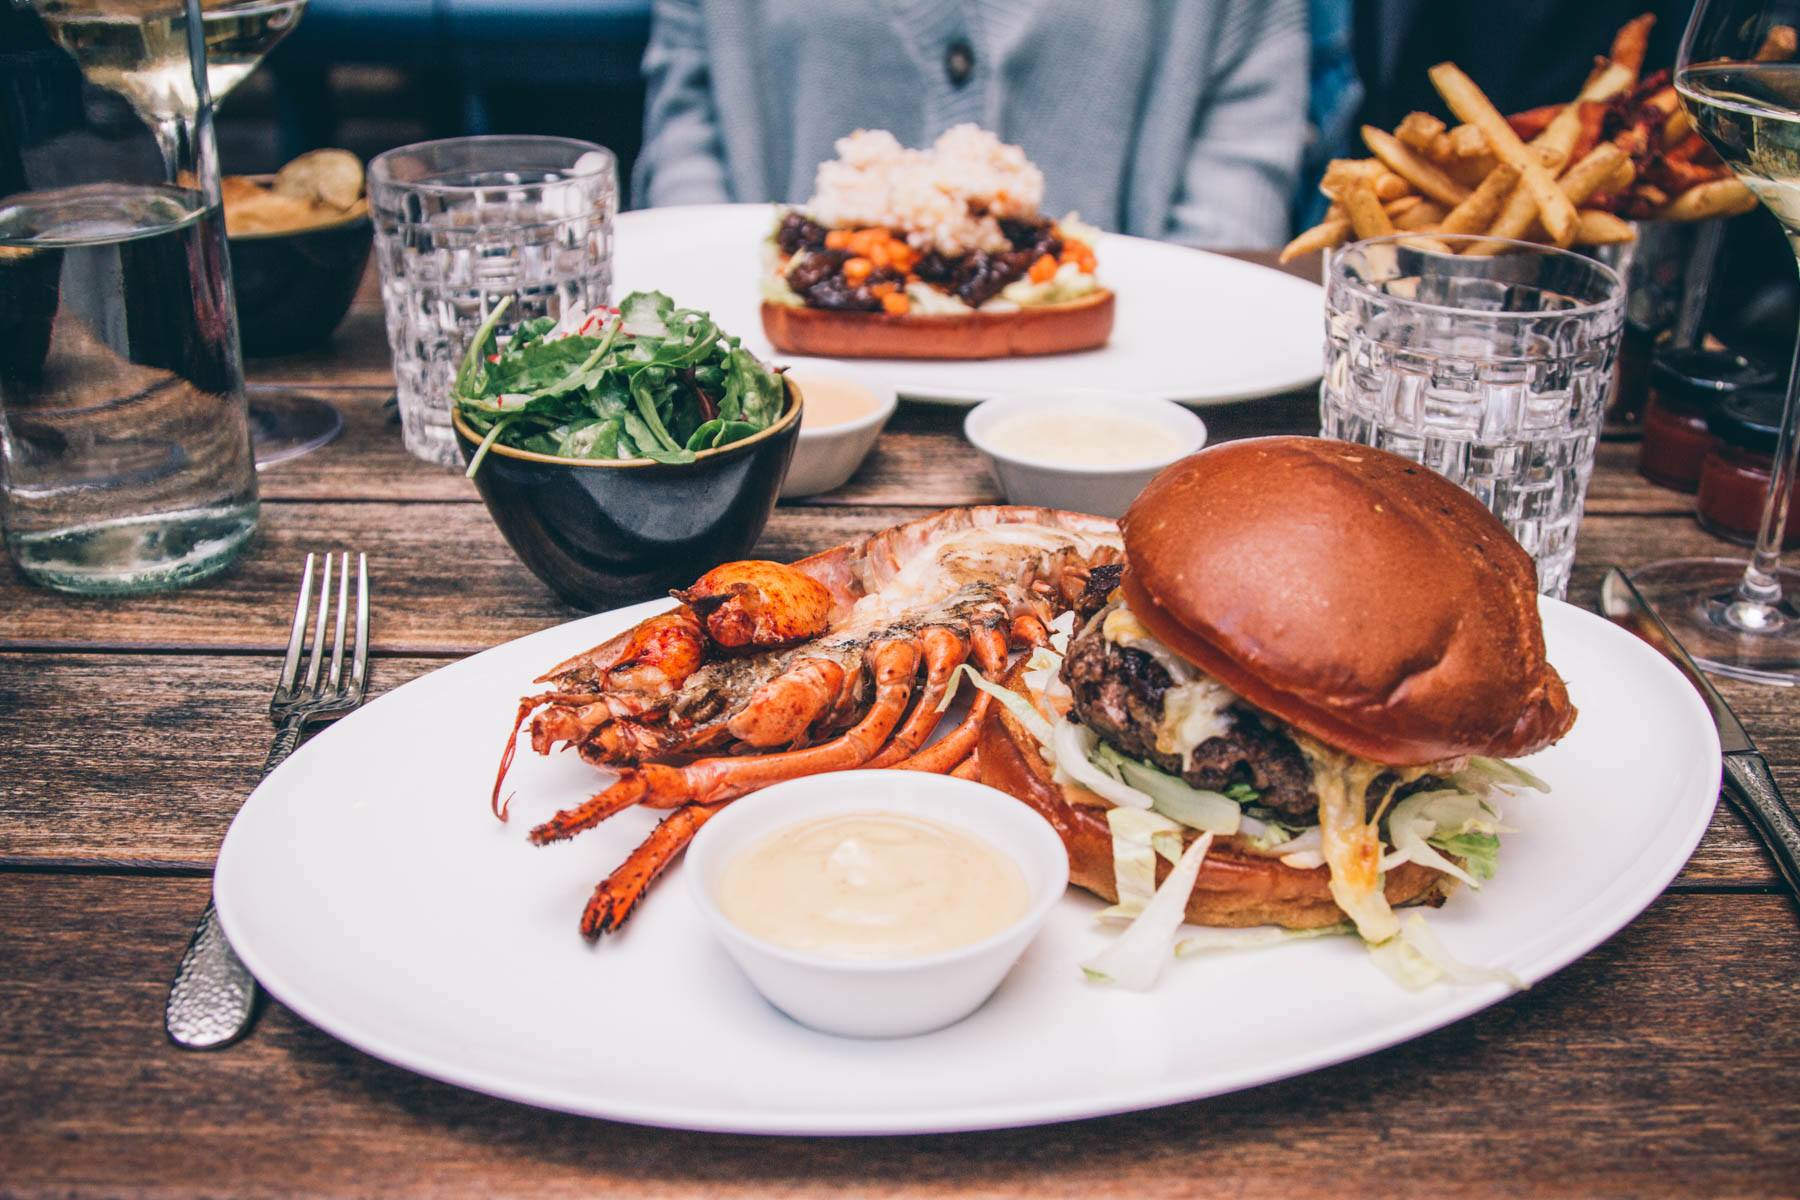 Geheimtipp Muenchen burger and lobster bank 73 – ©wunderland media GmbH